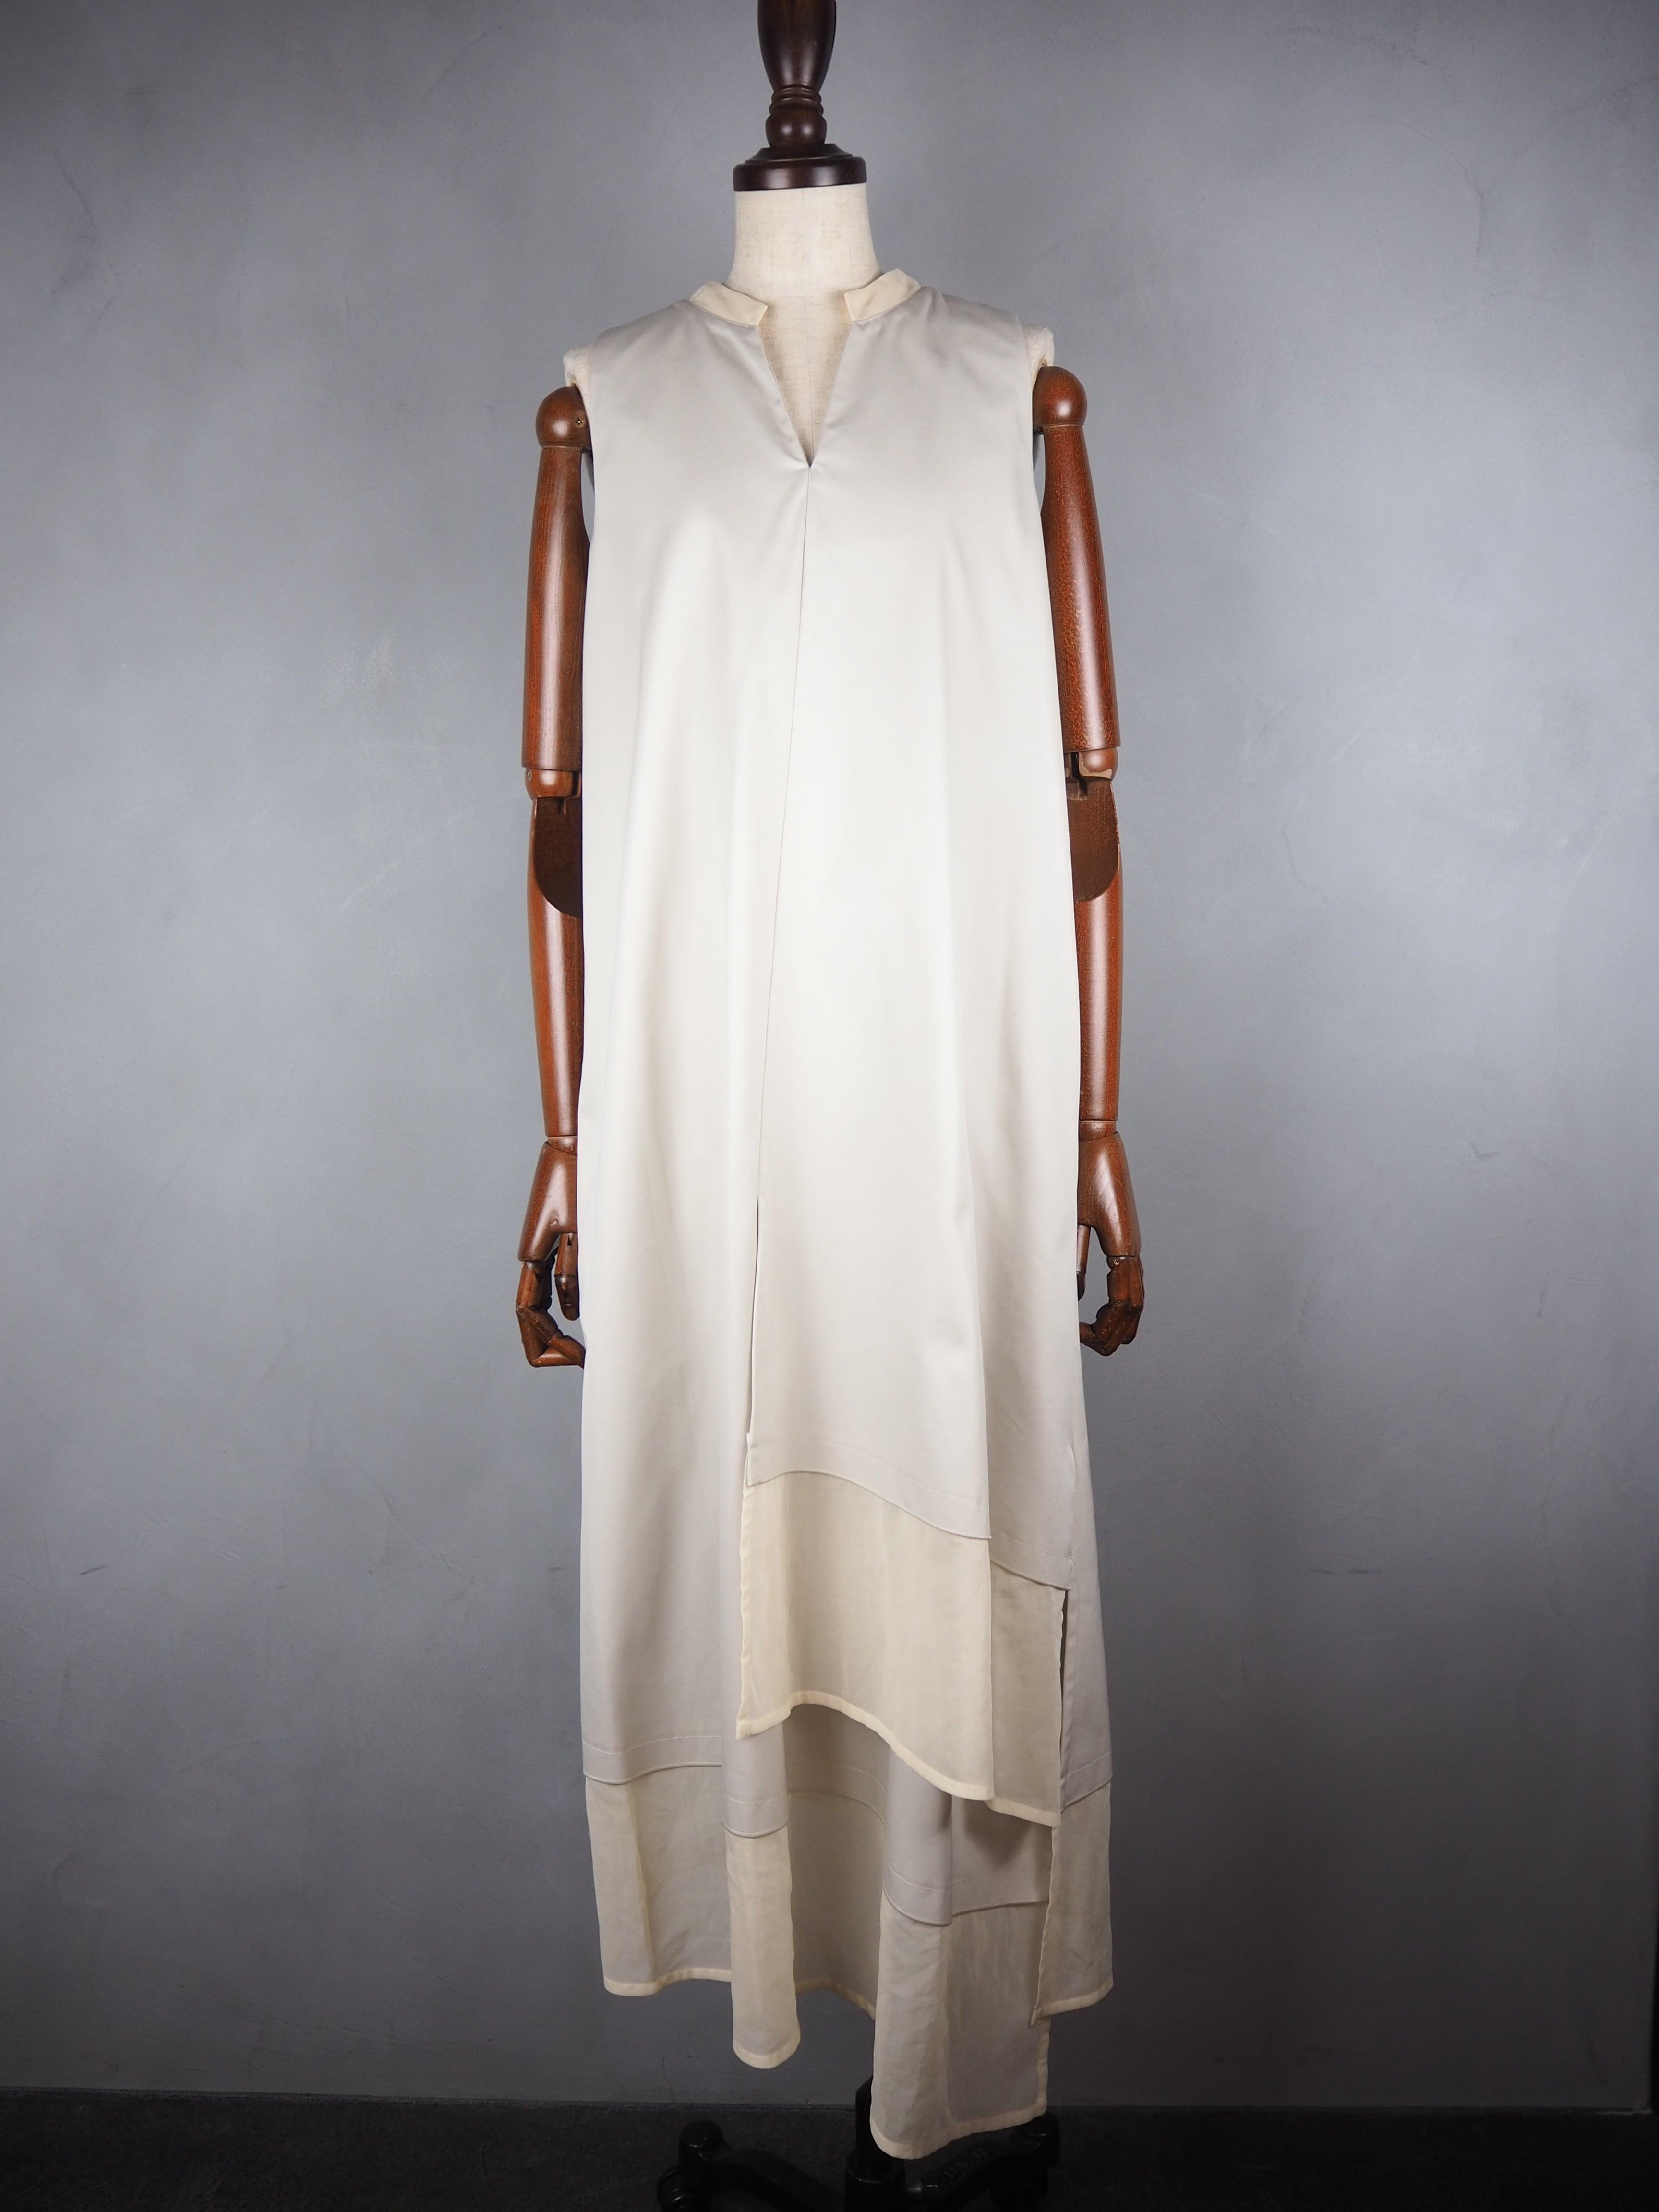 【ELIN】GABA/ORGANZA COMBI DRESS